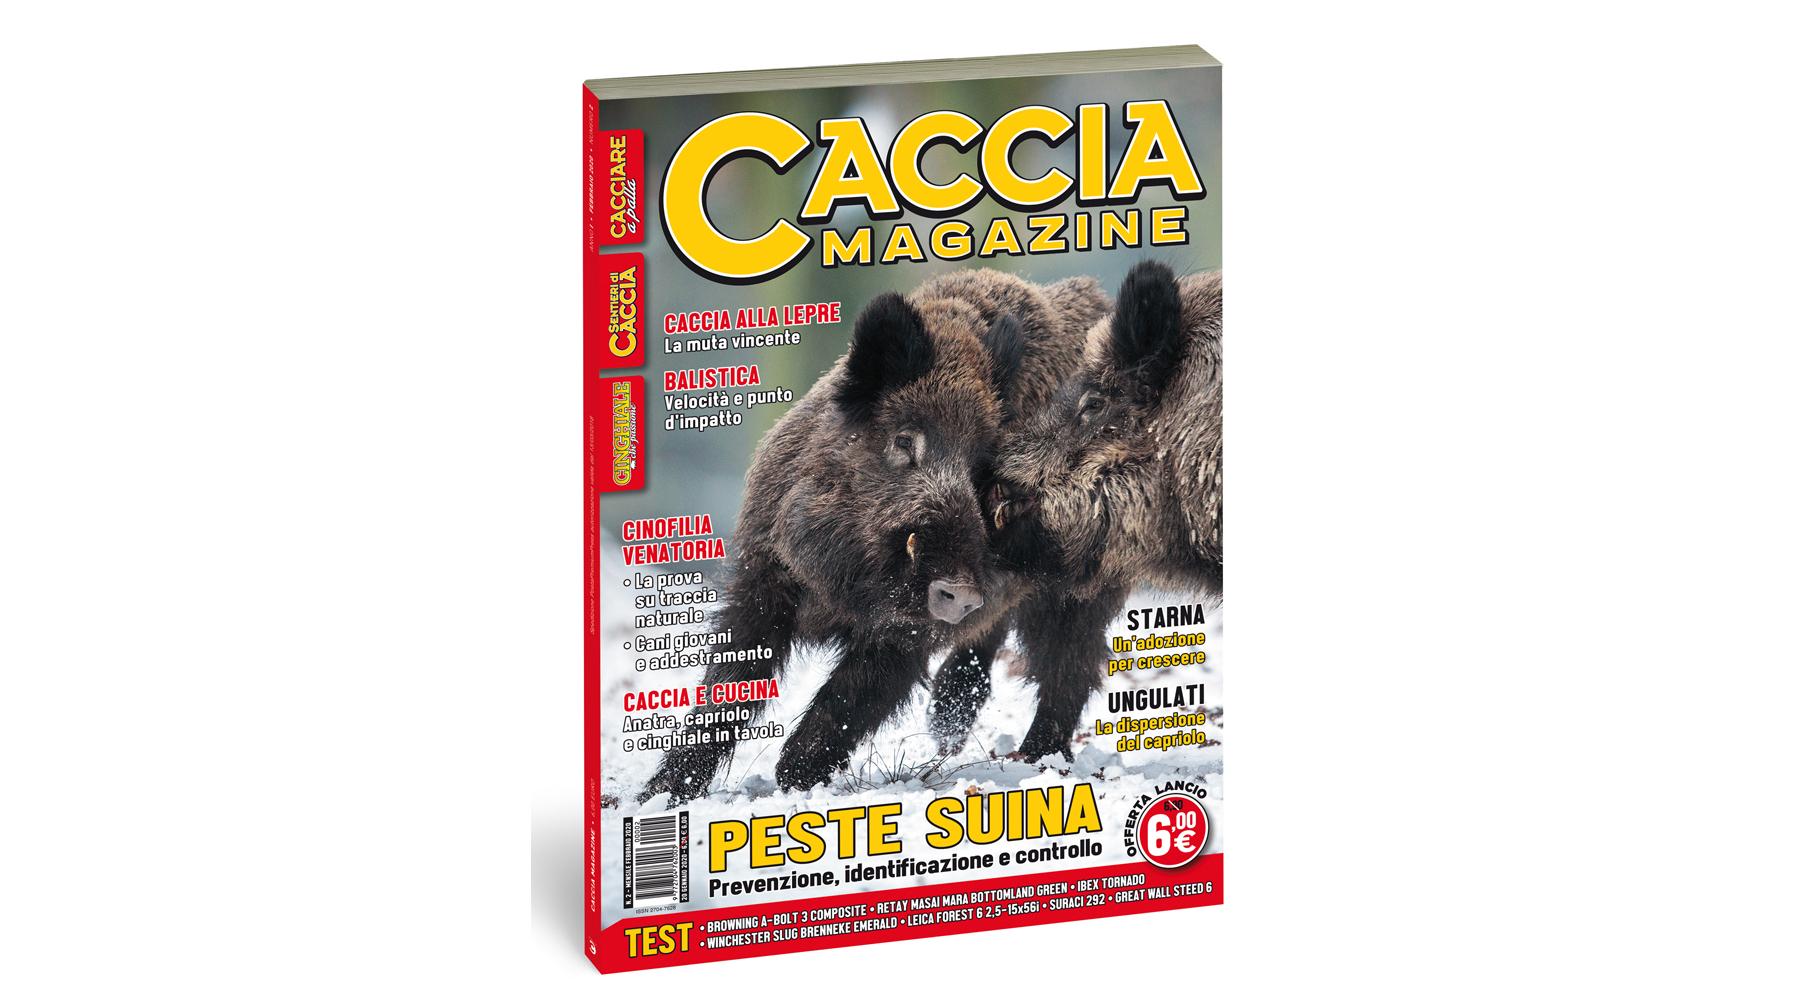 Caccia Magazine febbraio 2020 in edicola dal 20 gennaio